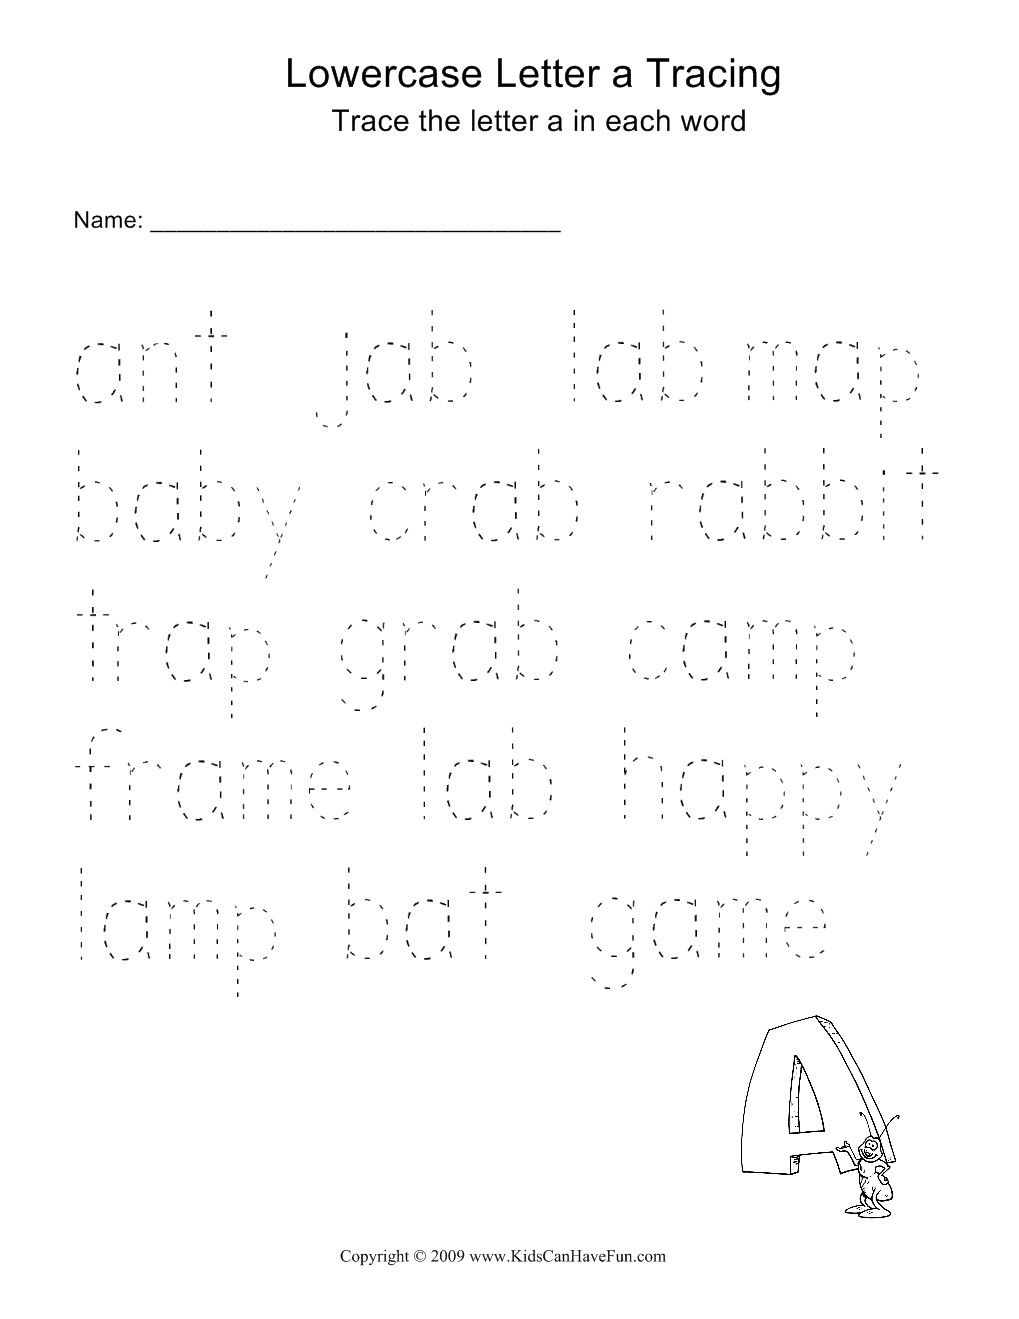 Word Tracing Worksheets For Kids | Kindergarten Reading intended for Alphabet Tracing Worksheets For 5 Year Olds